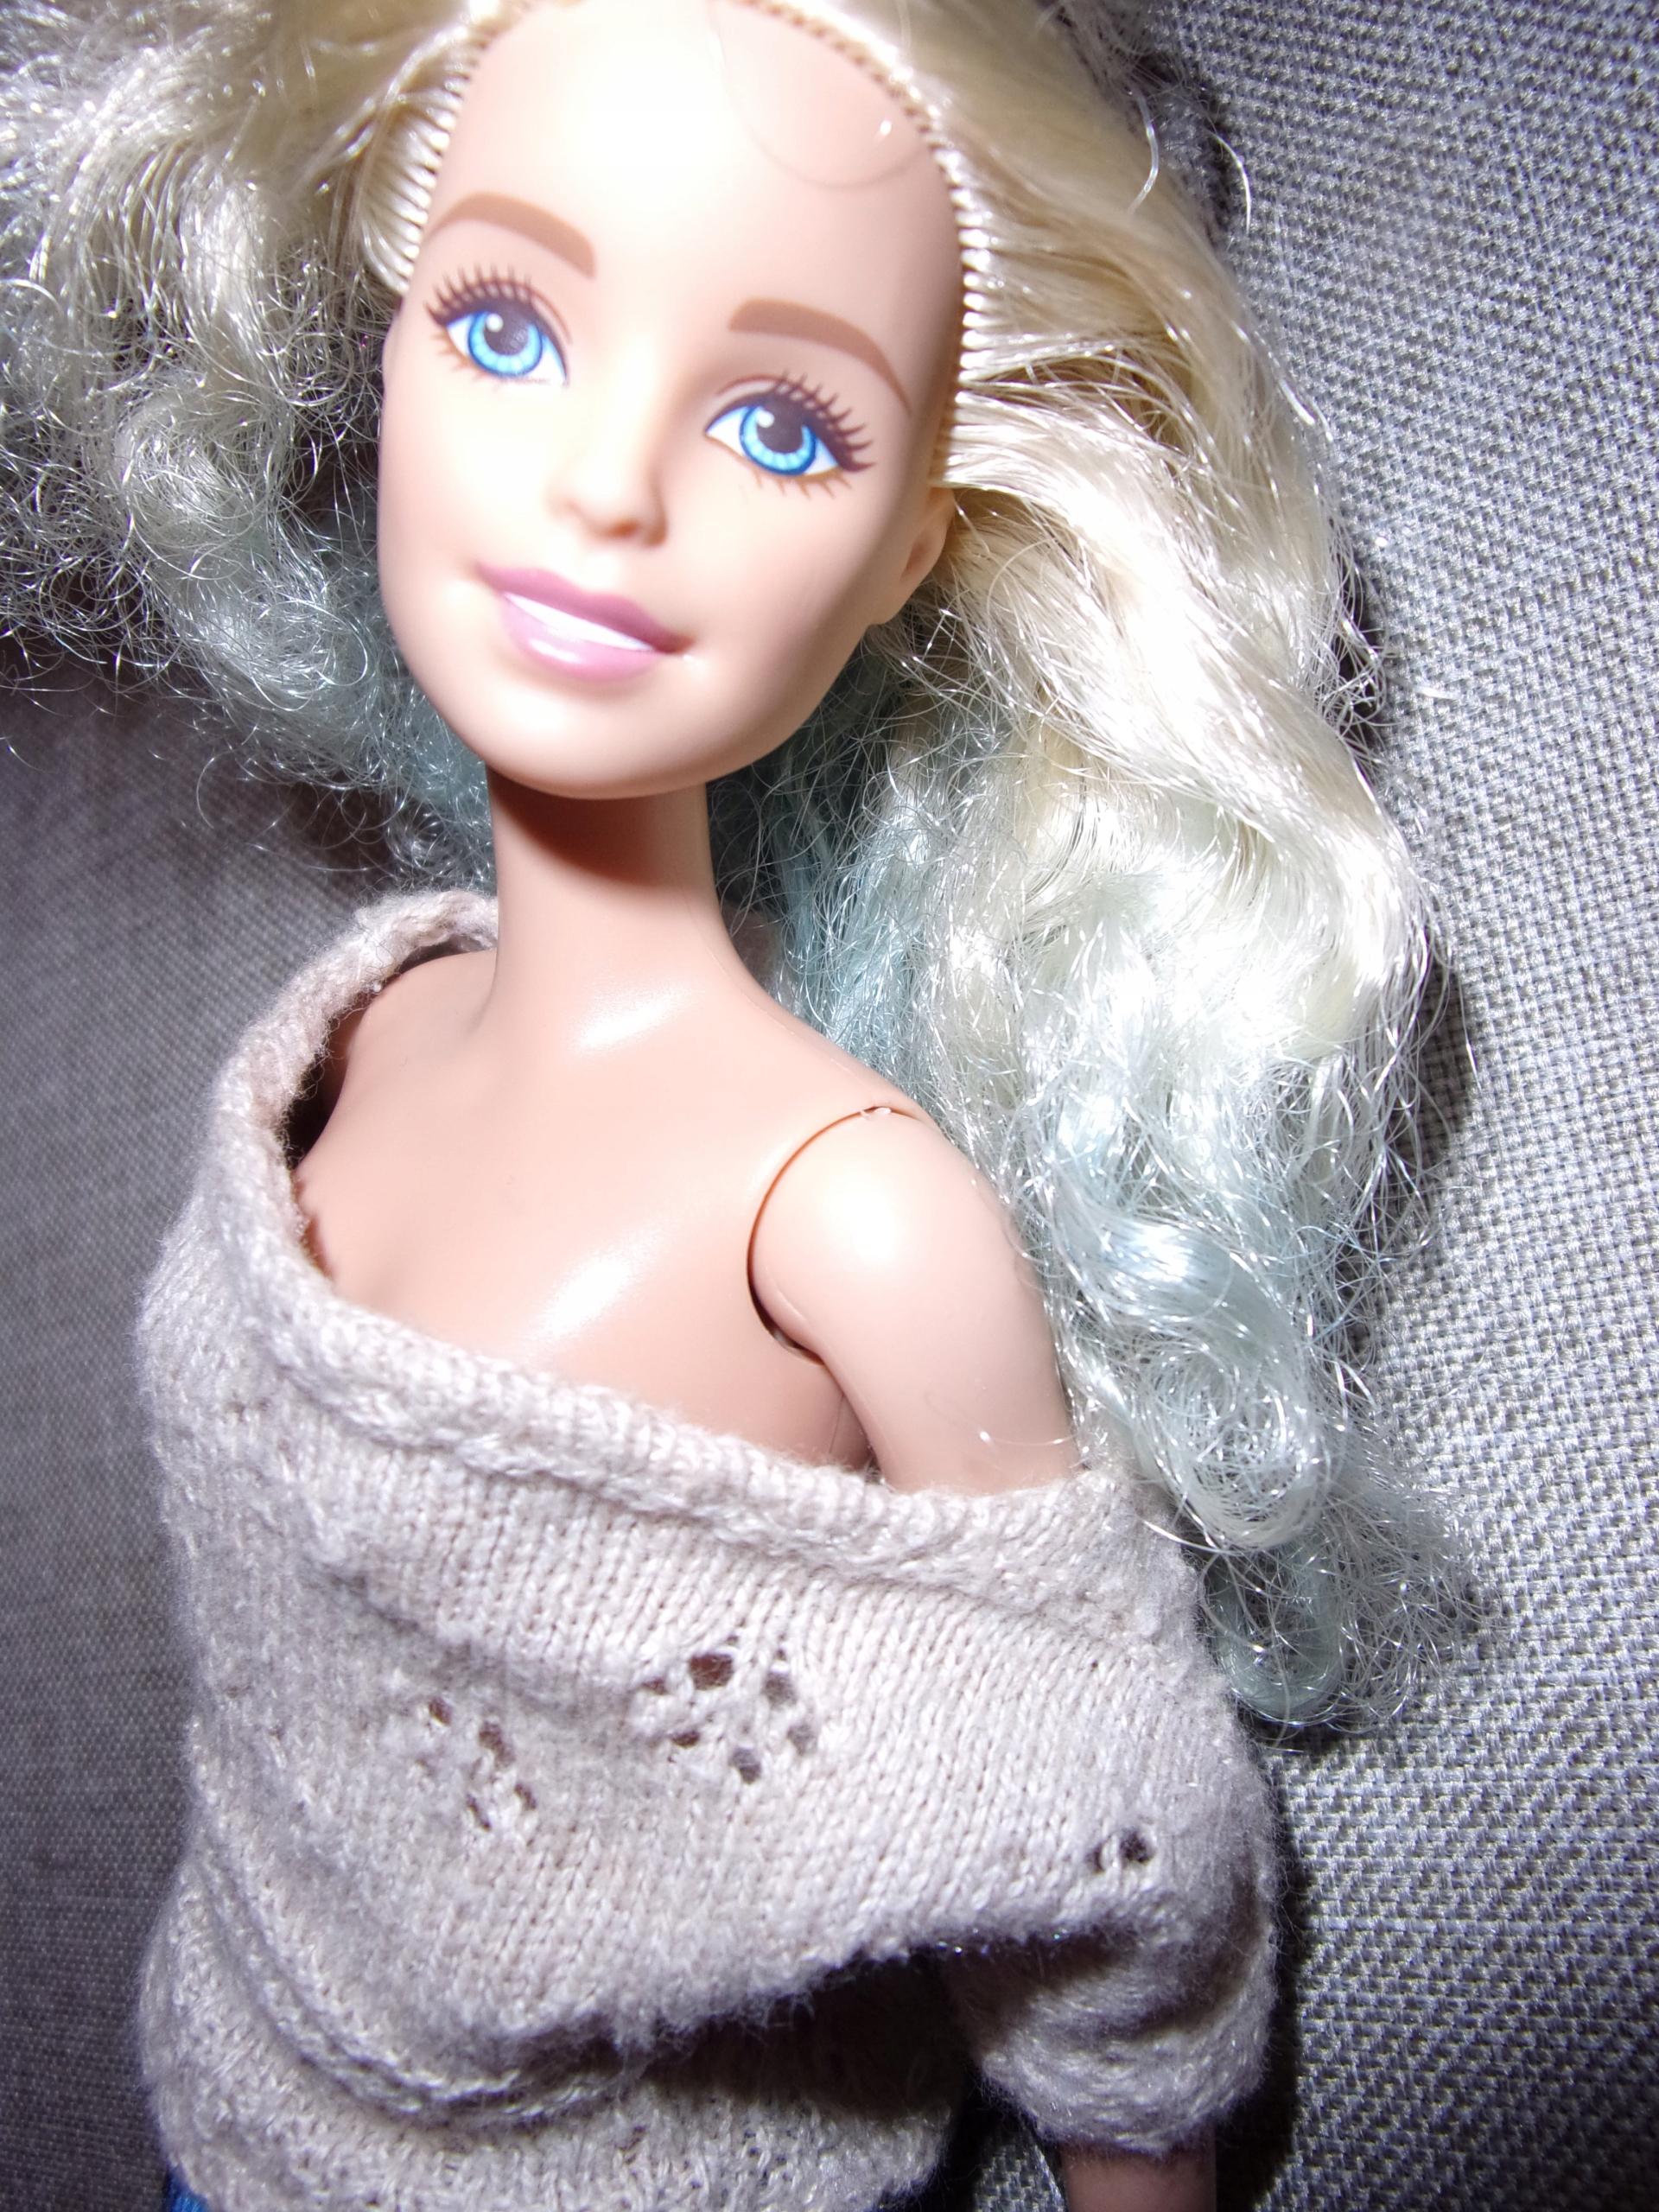 Bluzka Lalki Barbie Mattel nietoperz